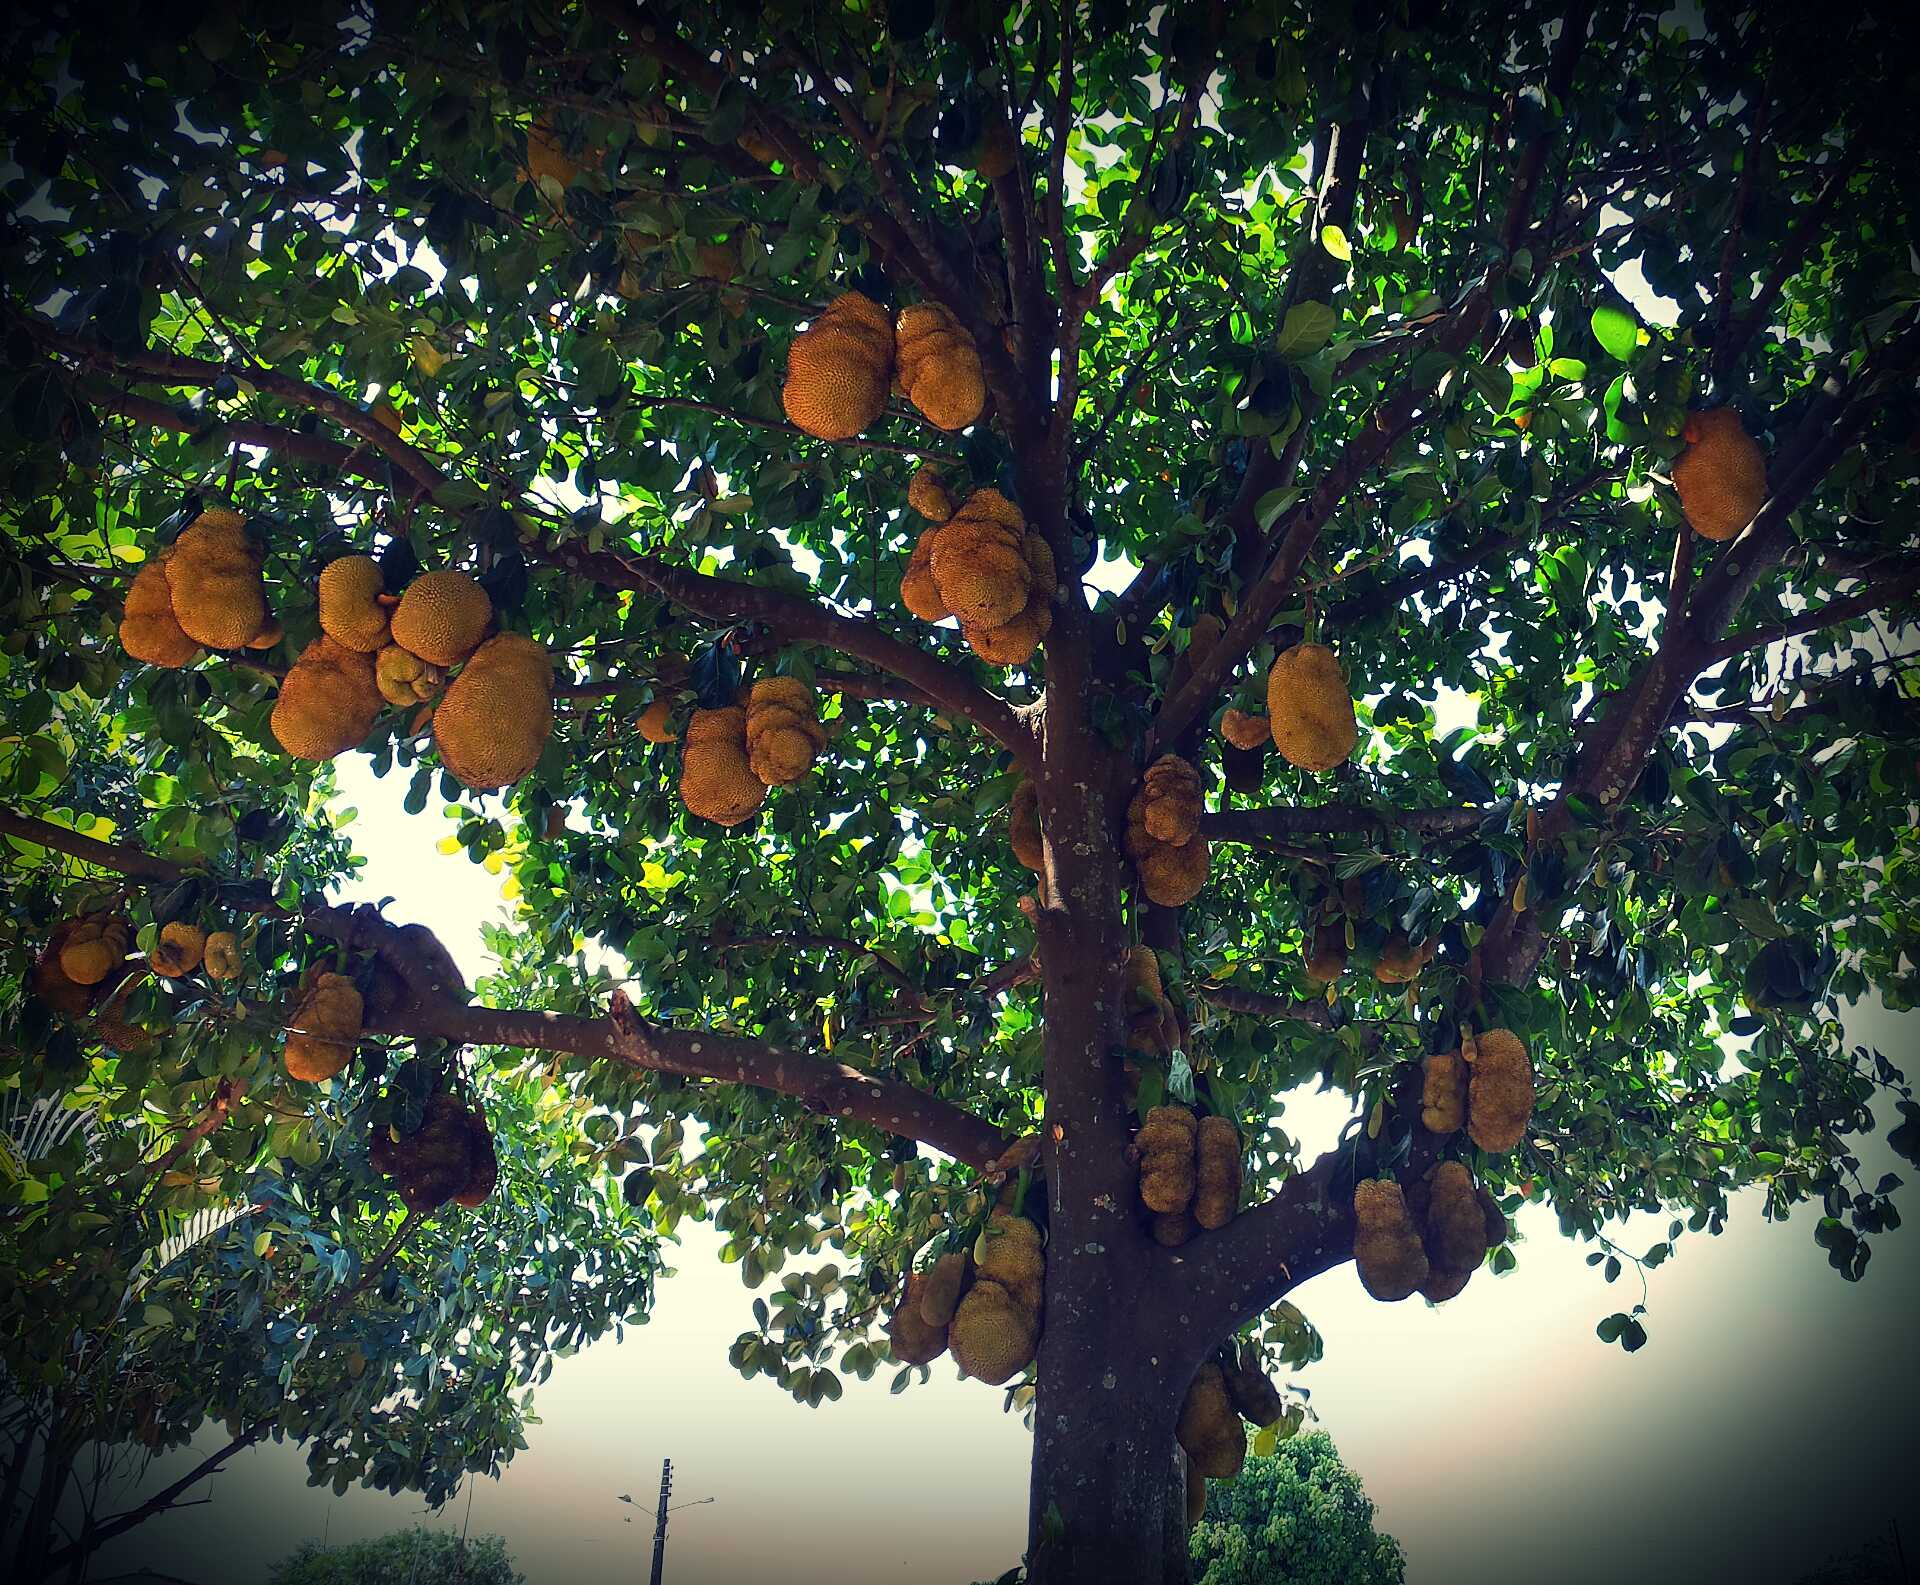 Jackfruit Trees & Their Graceful Abundance | Tribal Simplicity